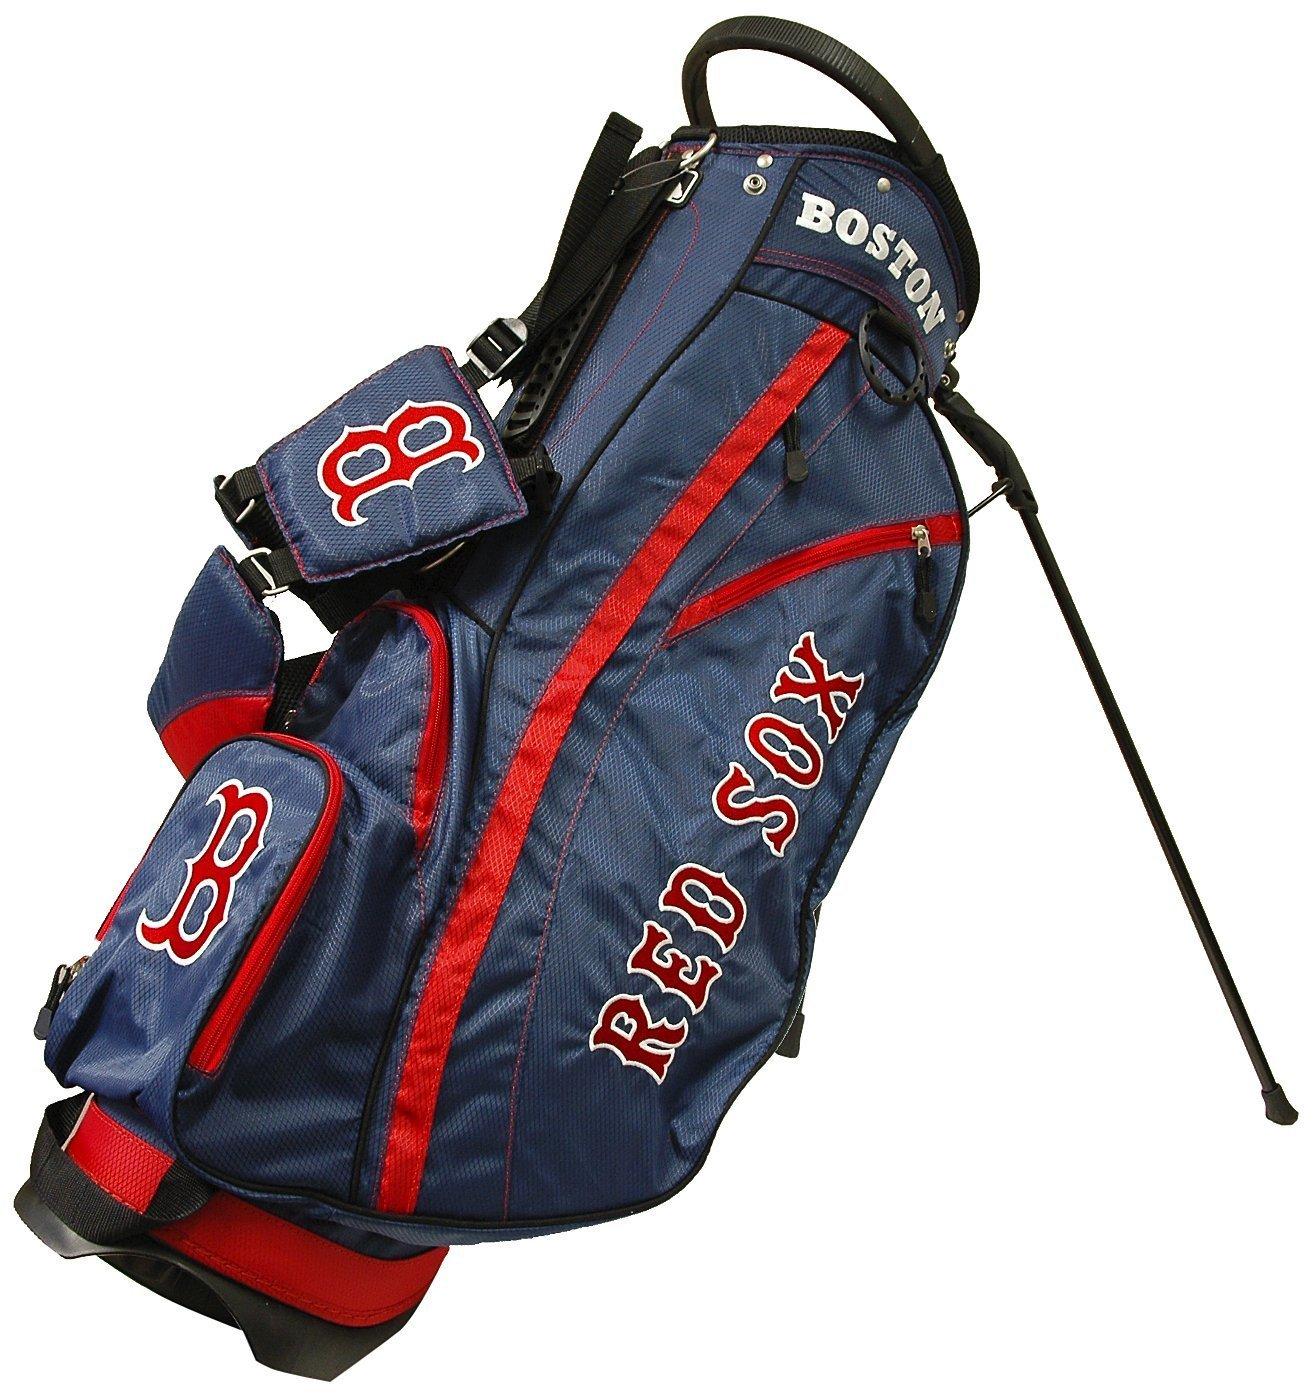 【PGAショーバイヤー買付商品】TEAMGOLF Stand Bag-14way Fairway(ヤンキースバージョン) レッドソックス B008NQH8R6